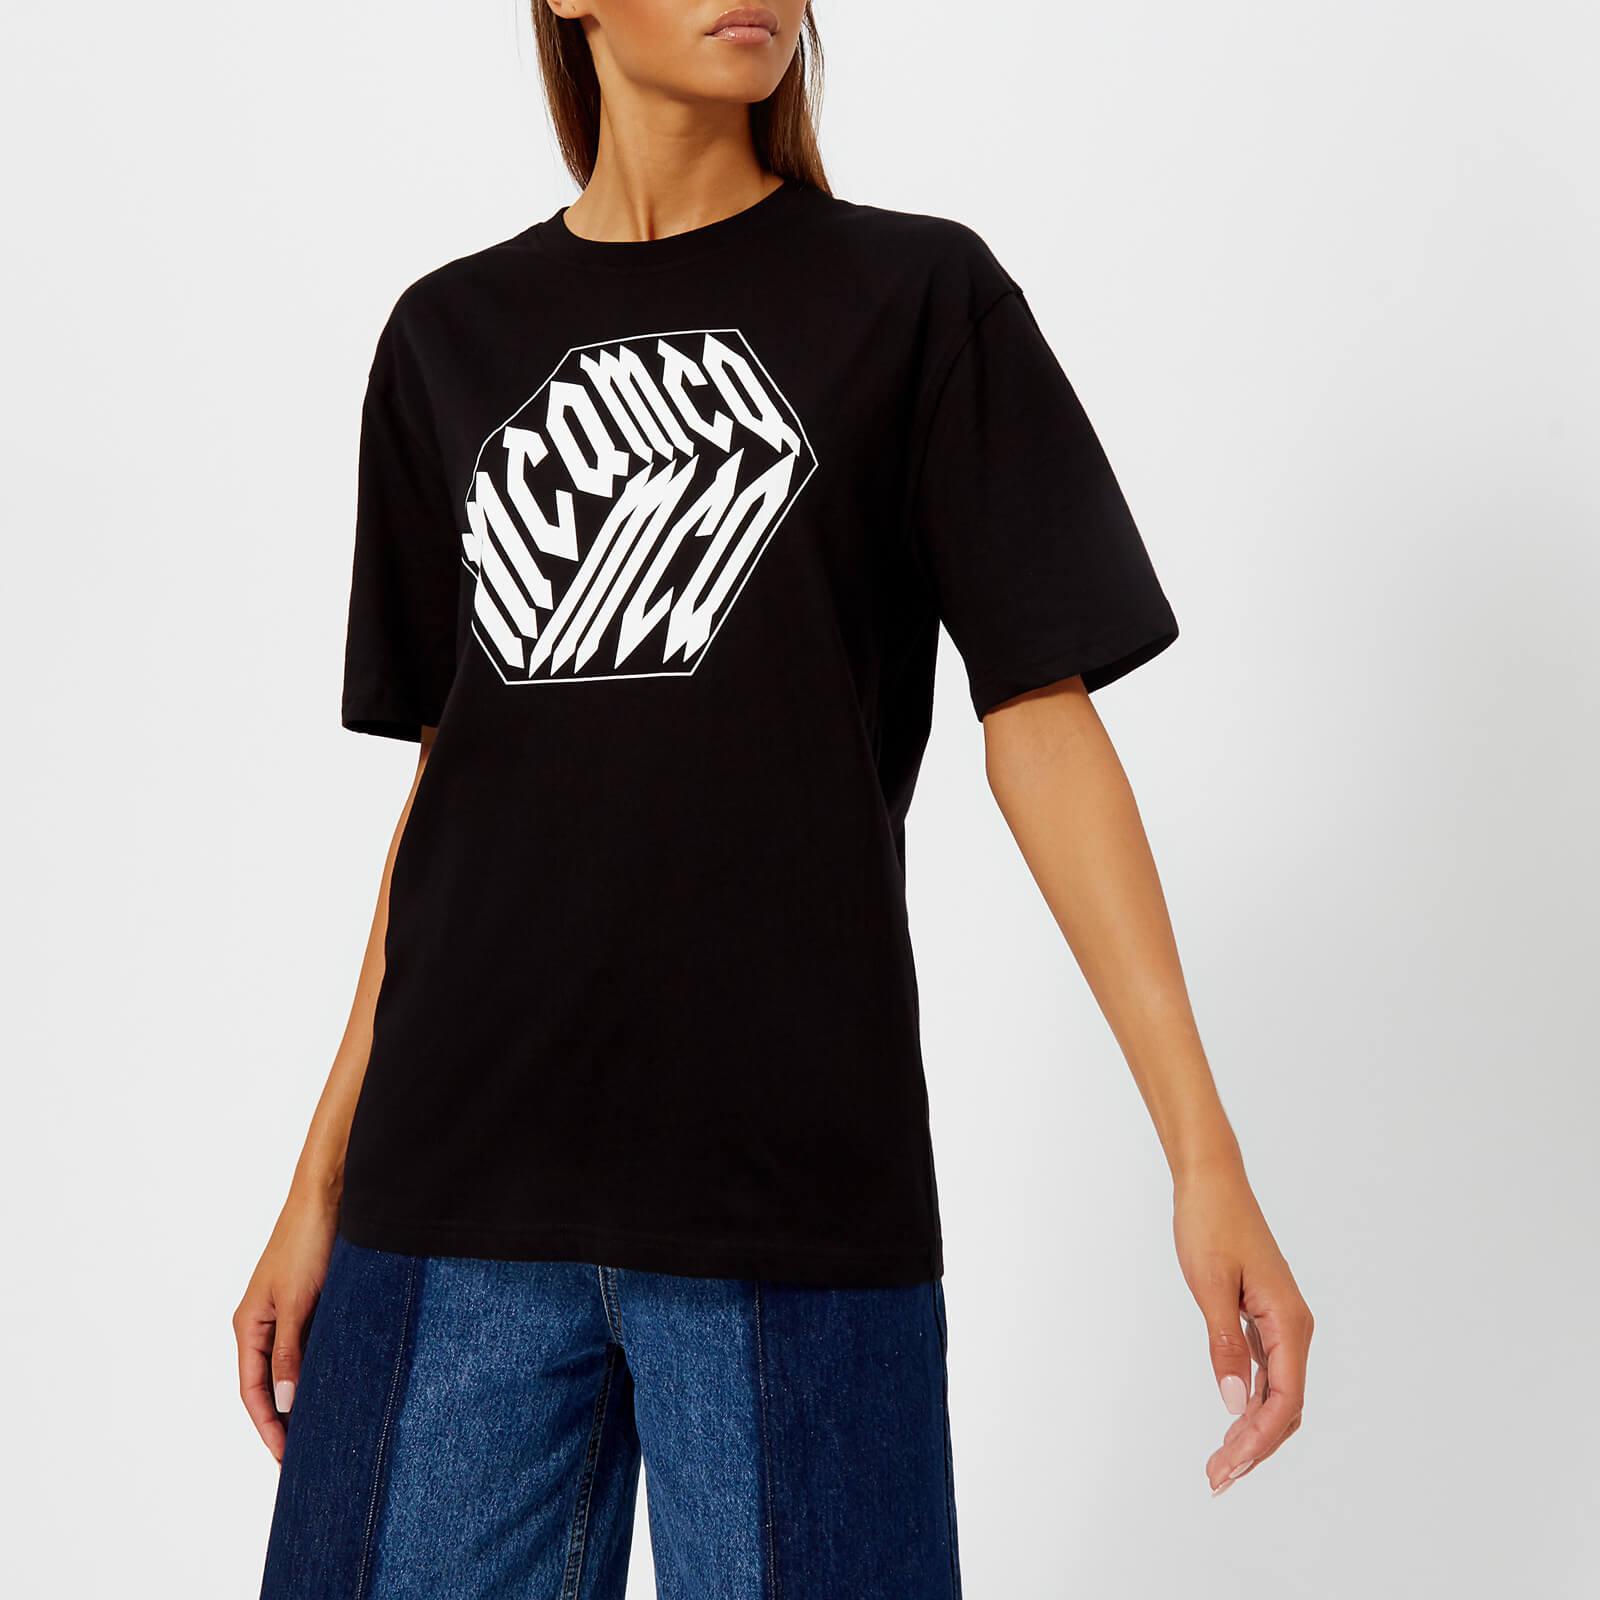 cba2e694 McQ Alexander McQueen Women's Boyfriend T-Shirt - Darkest Black - Free UK  Delivery over £50